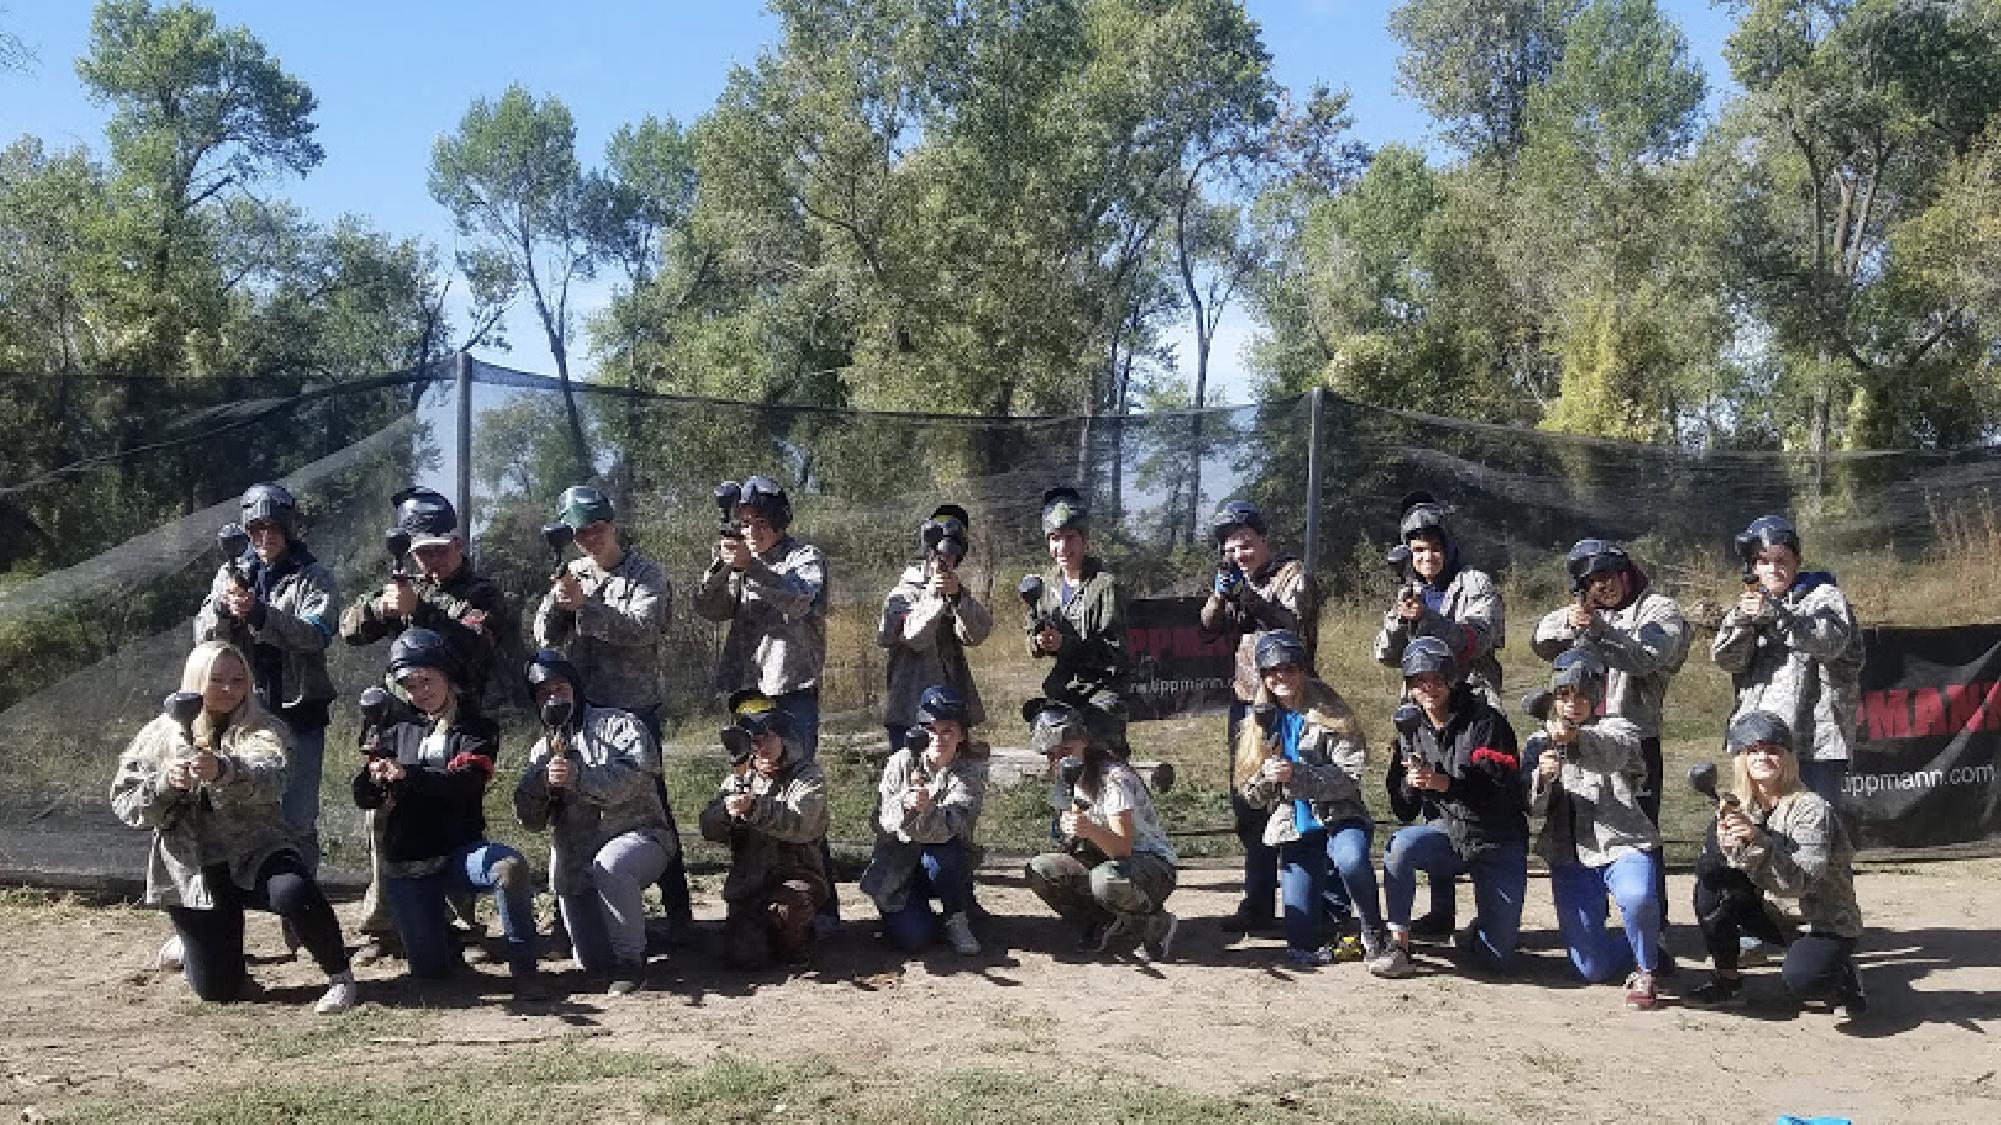 We had groups from Idaho Falls, Ashton, Rigby and Rexburg on Saturday